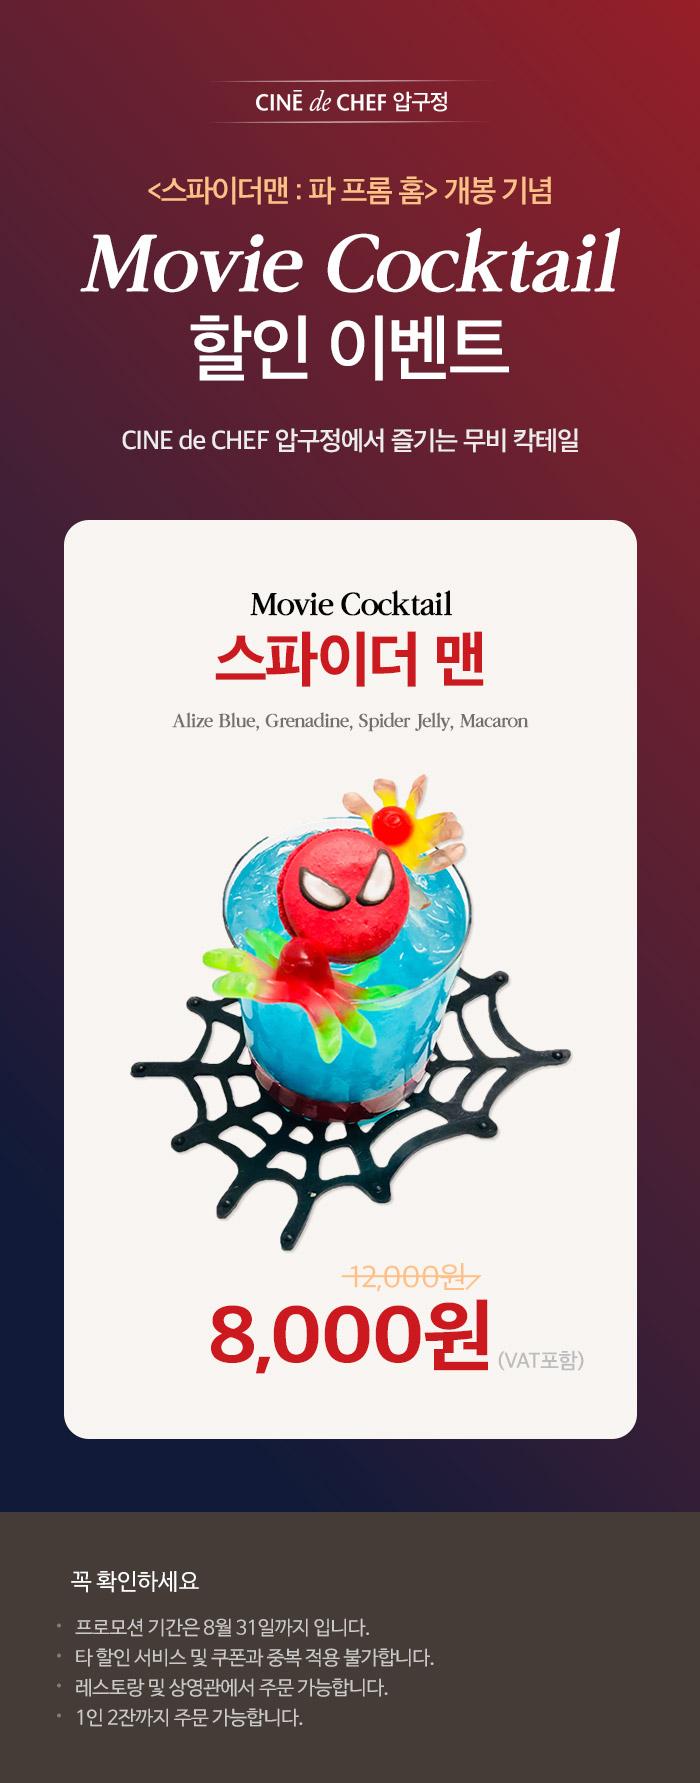 CGV극장별 [씨네드쉐프 압구정] Movie Cocktail 할인 이벤트